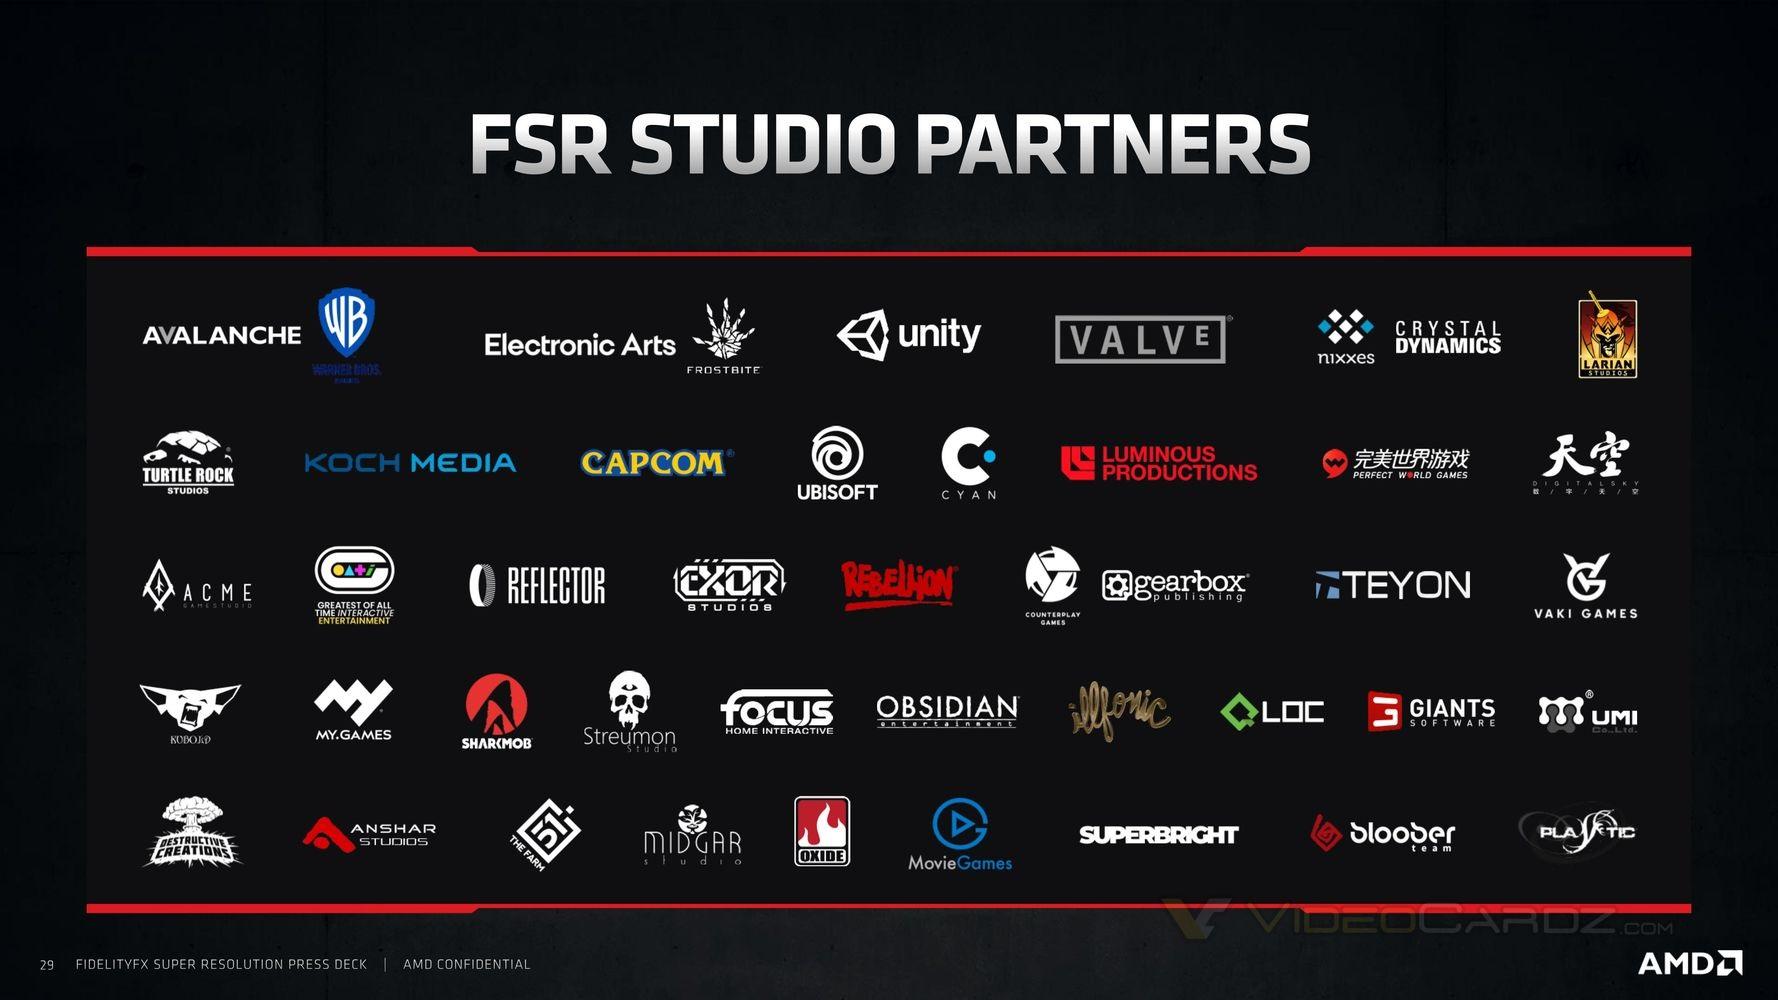 AMD FSR studio partners